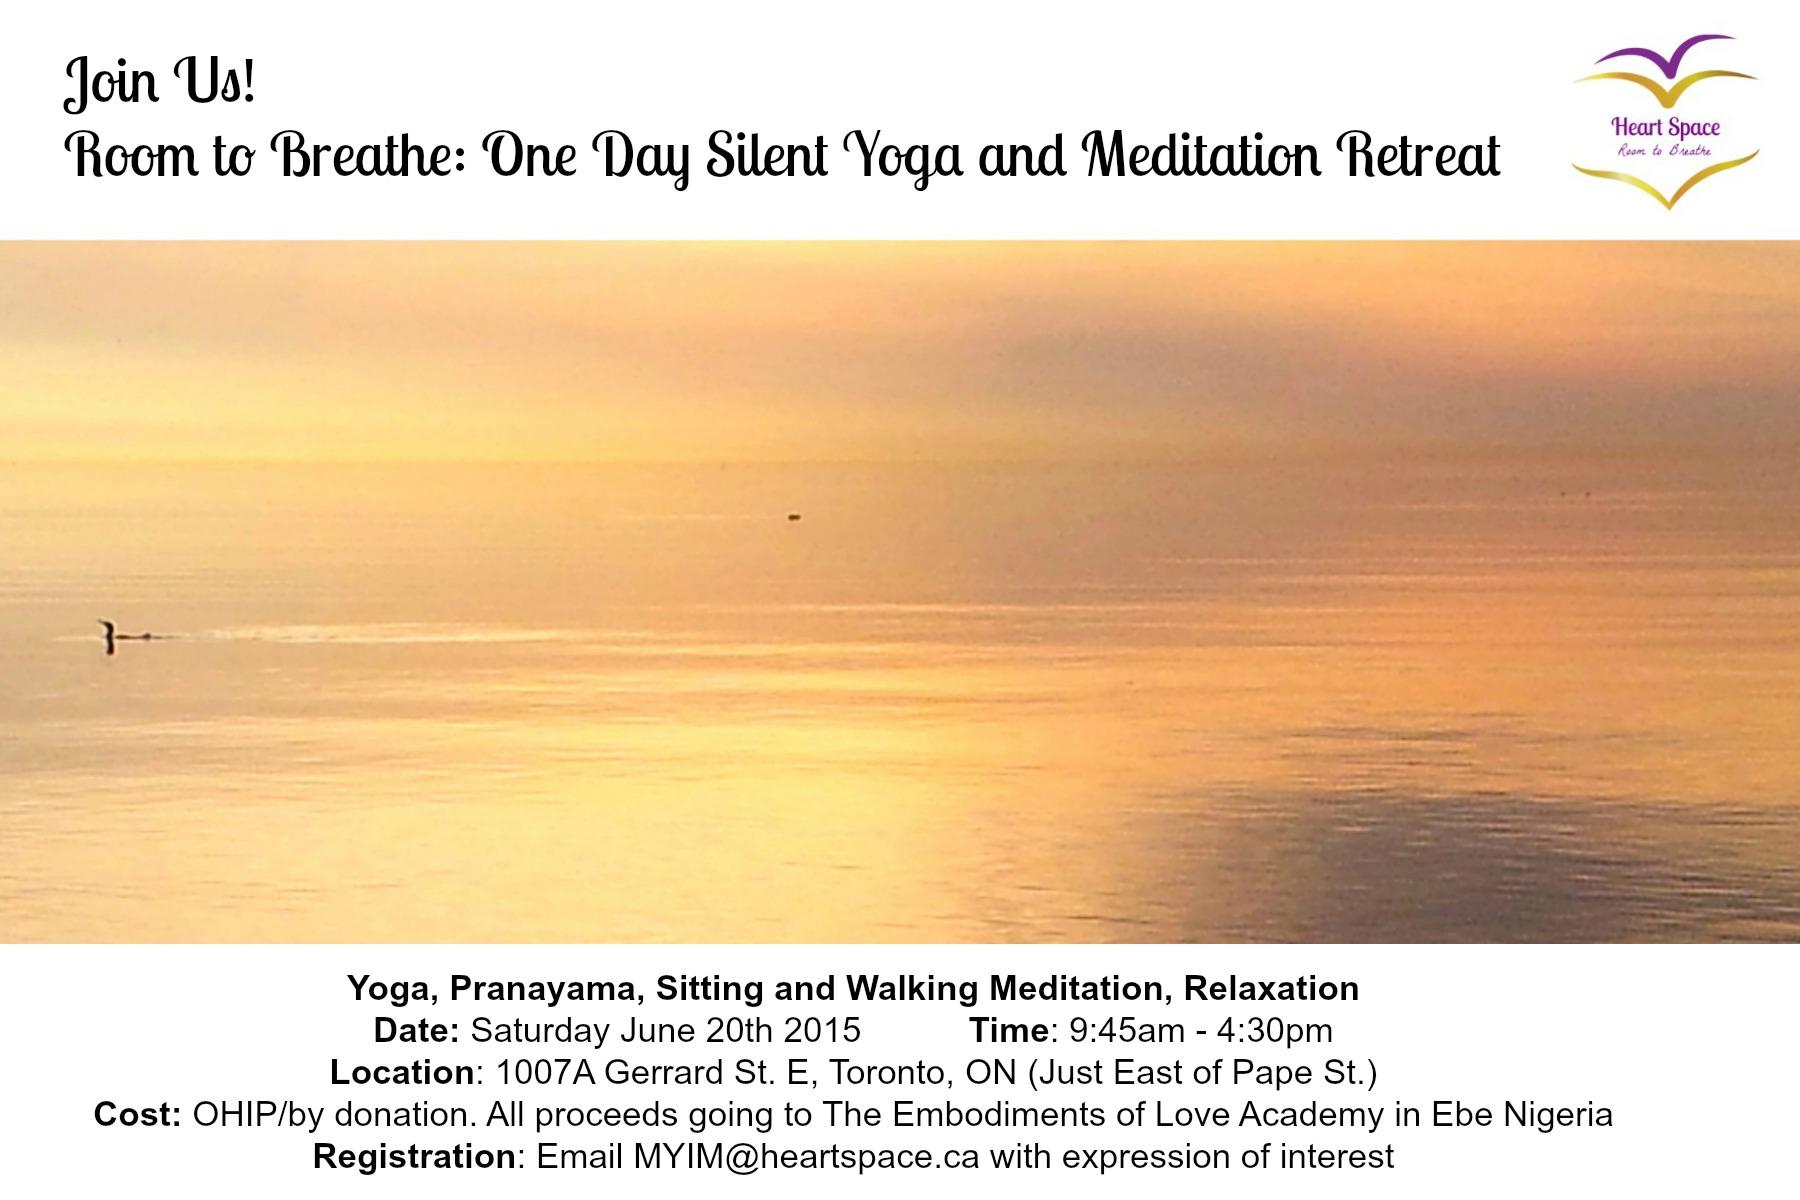 Yoga and Meditation Retreat in Toronto: June 20th 2015!